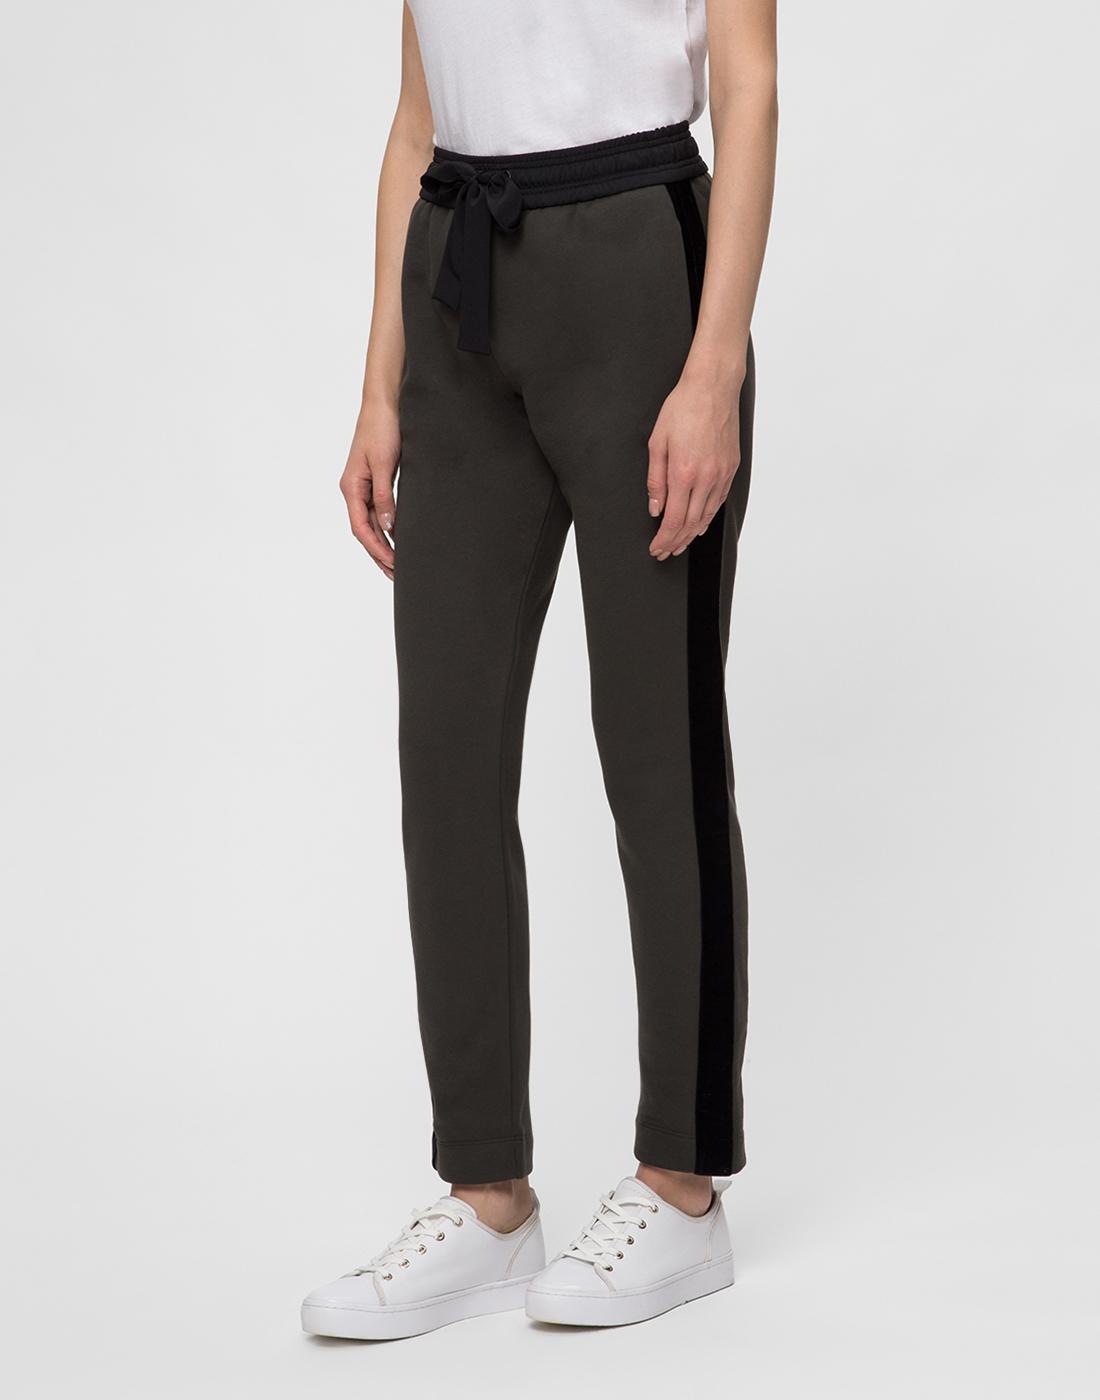 Женские зеленые брюки Dorothee Schumacher S128002-3